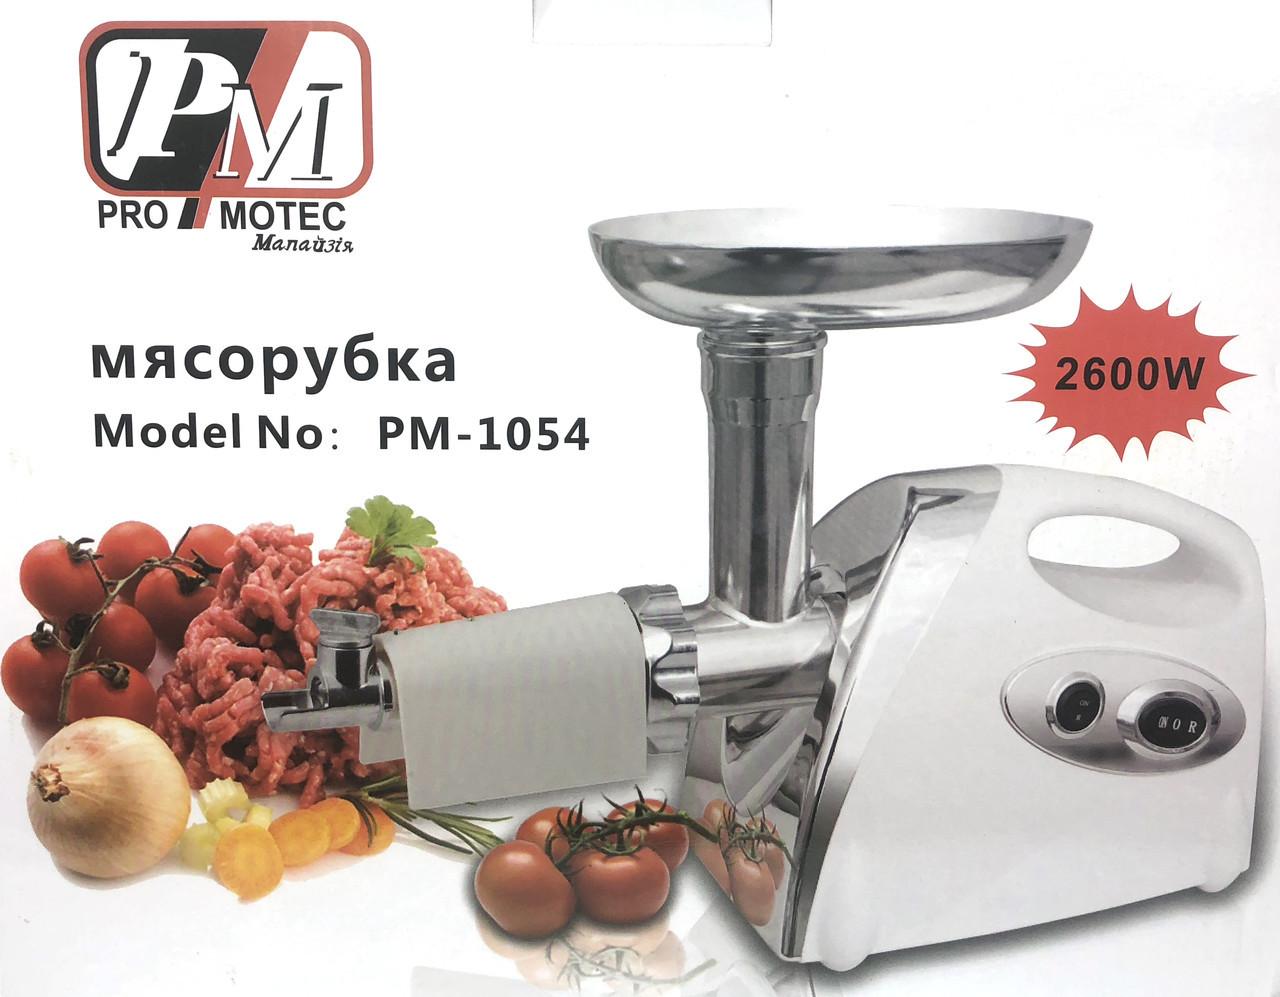 Мясорубка + Соковыжималка ProMotec 2600W Электромясорубка комбайн